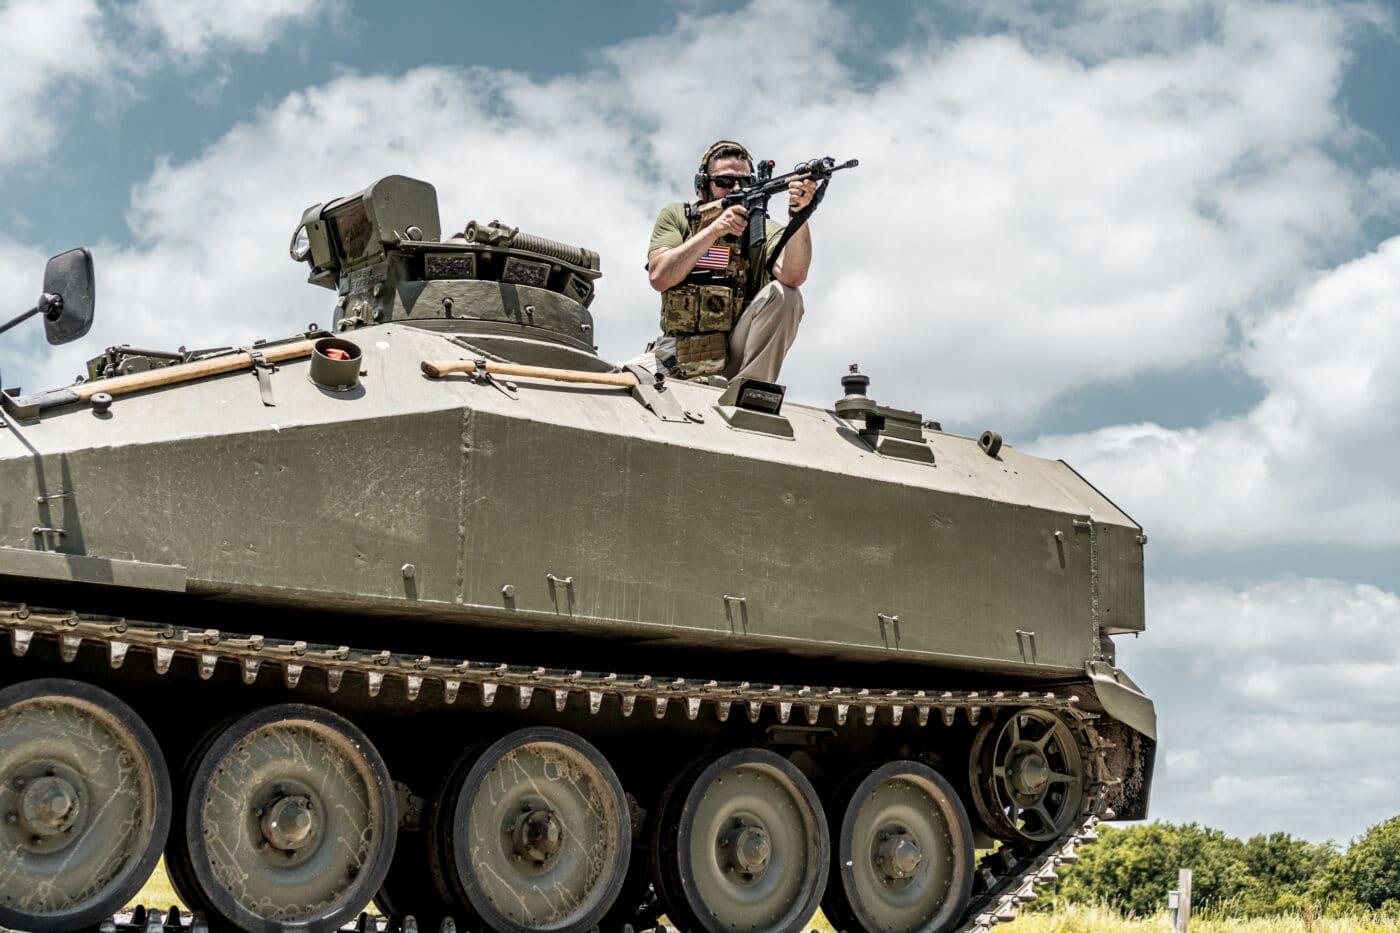 Man testing the HRT body armor from an APC